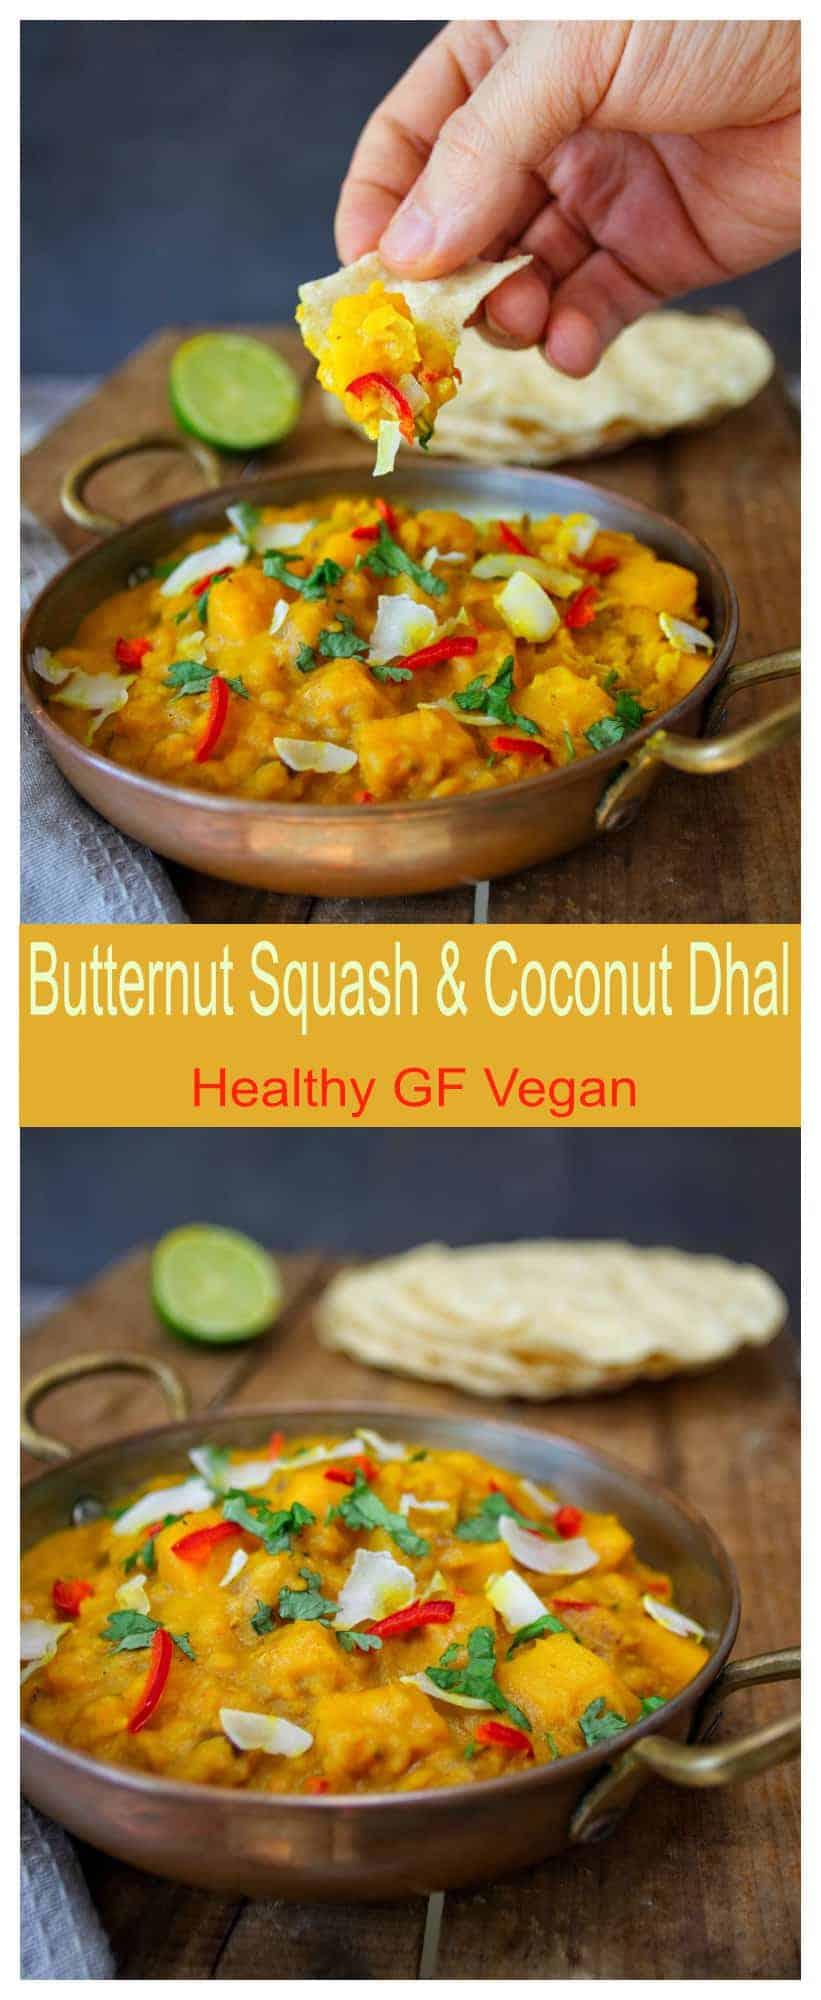 Butternut Squash & Coconut Dhal